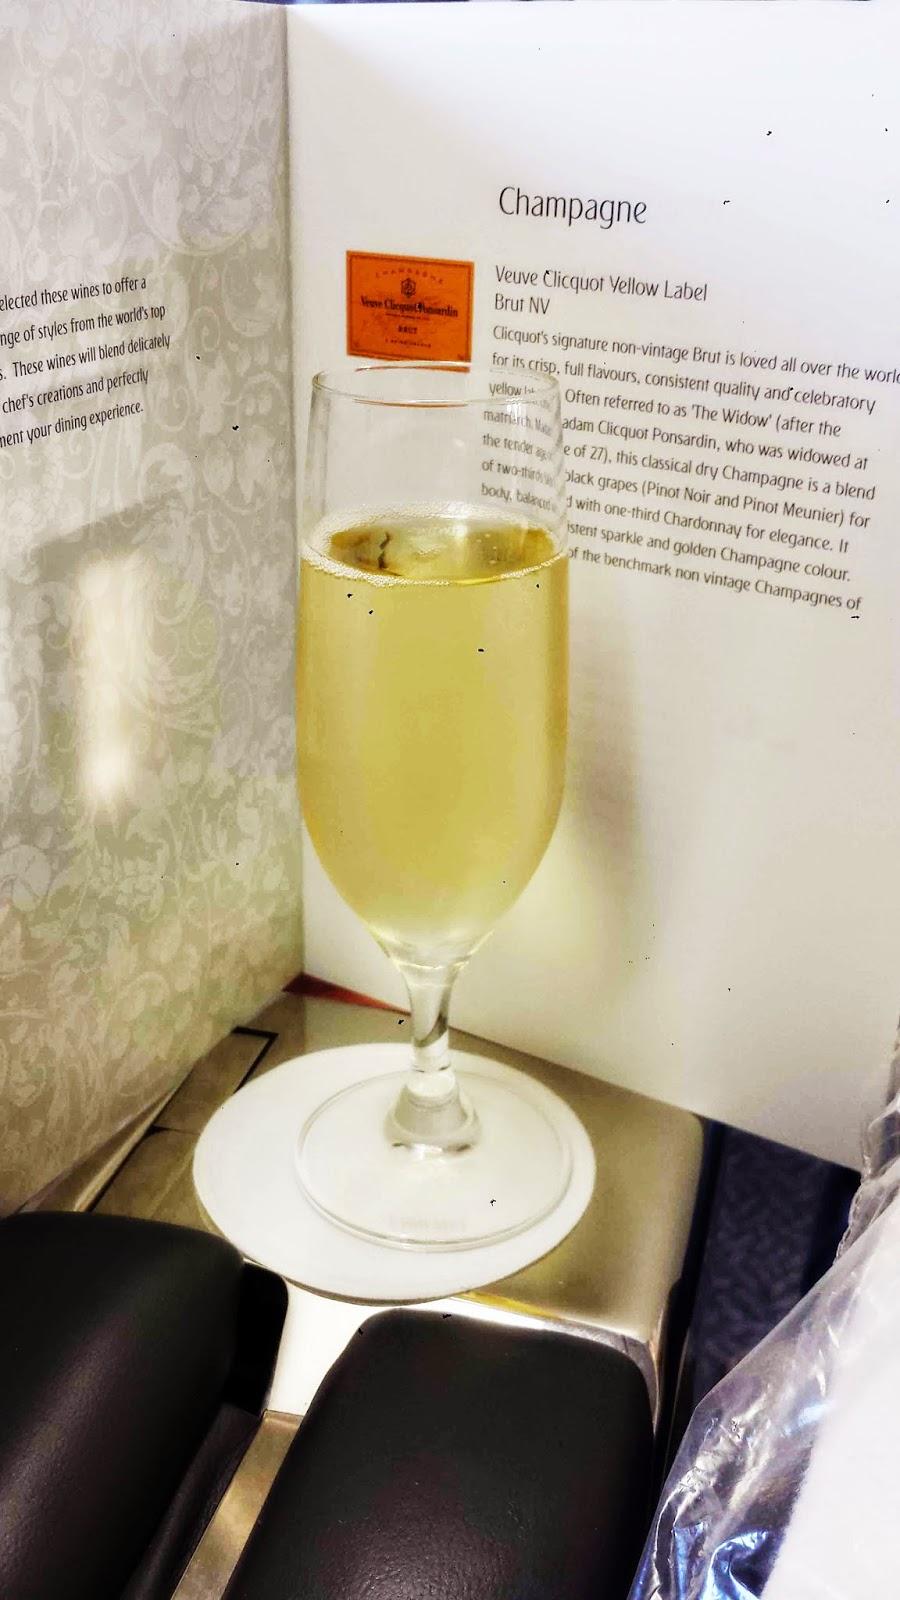 Free flowing Veuve Clicquot